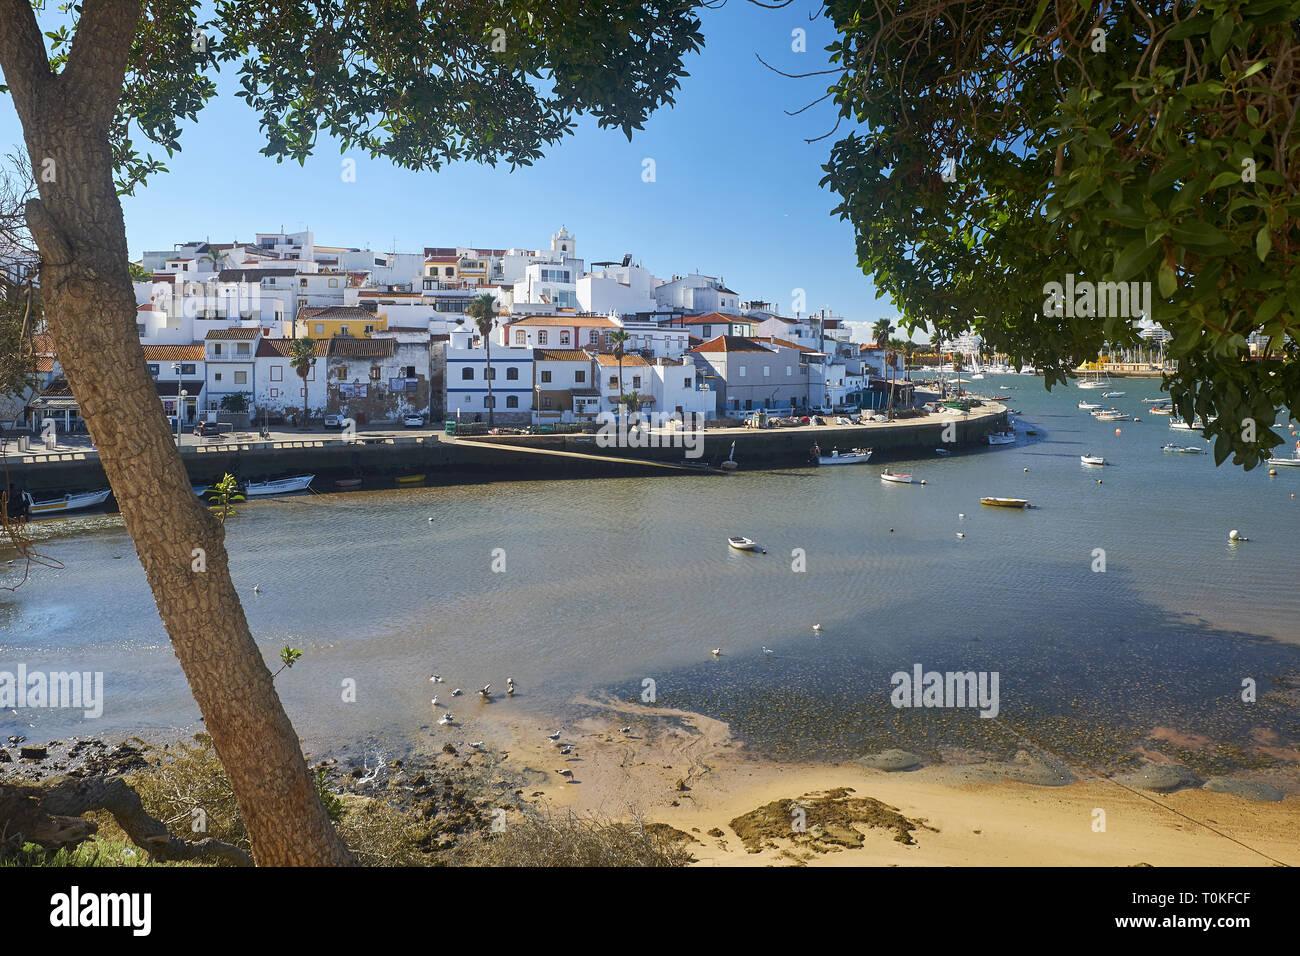 Fishing village Ferragudo, Faro, Algarve, Portugal - Stock Image